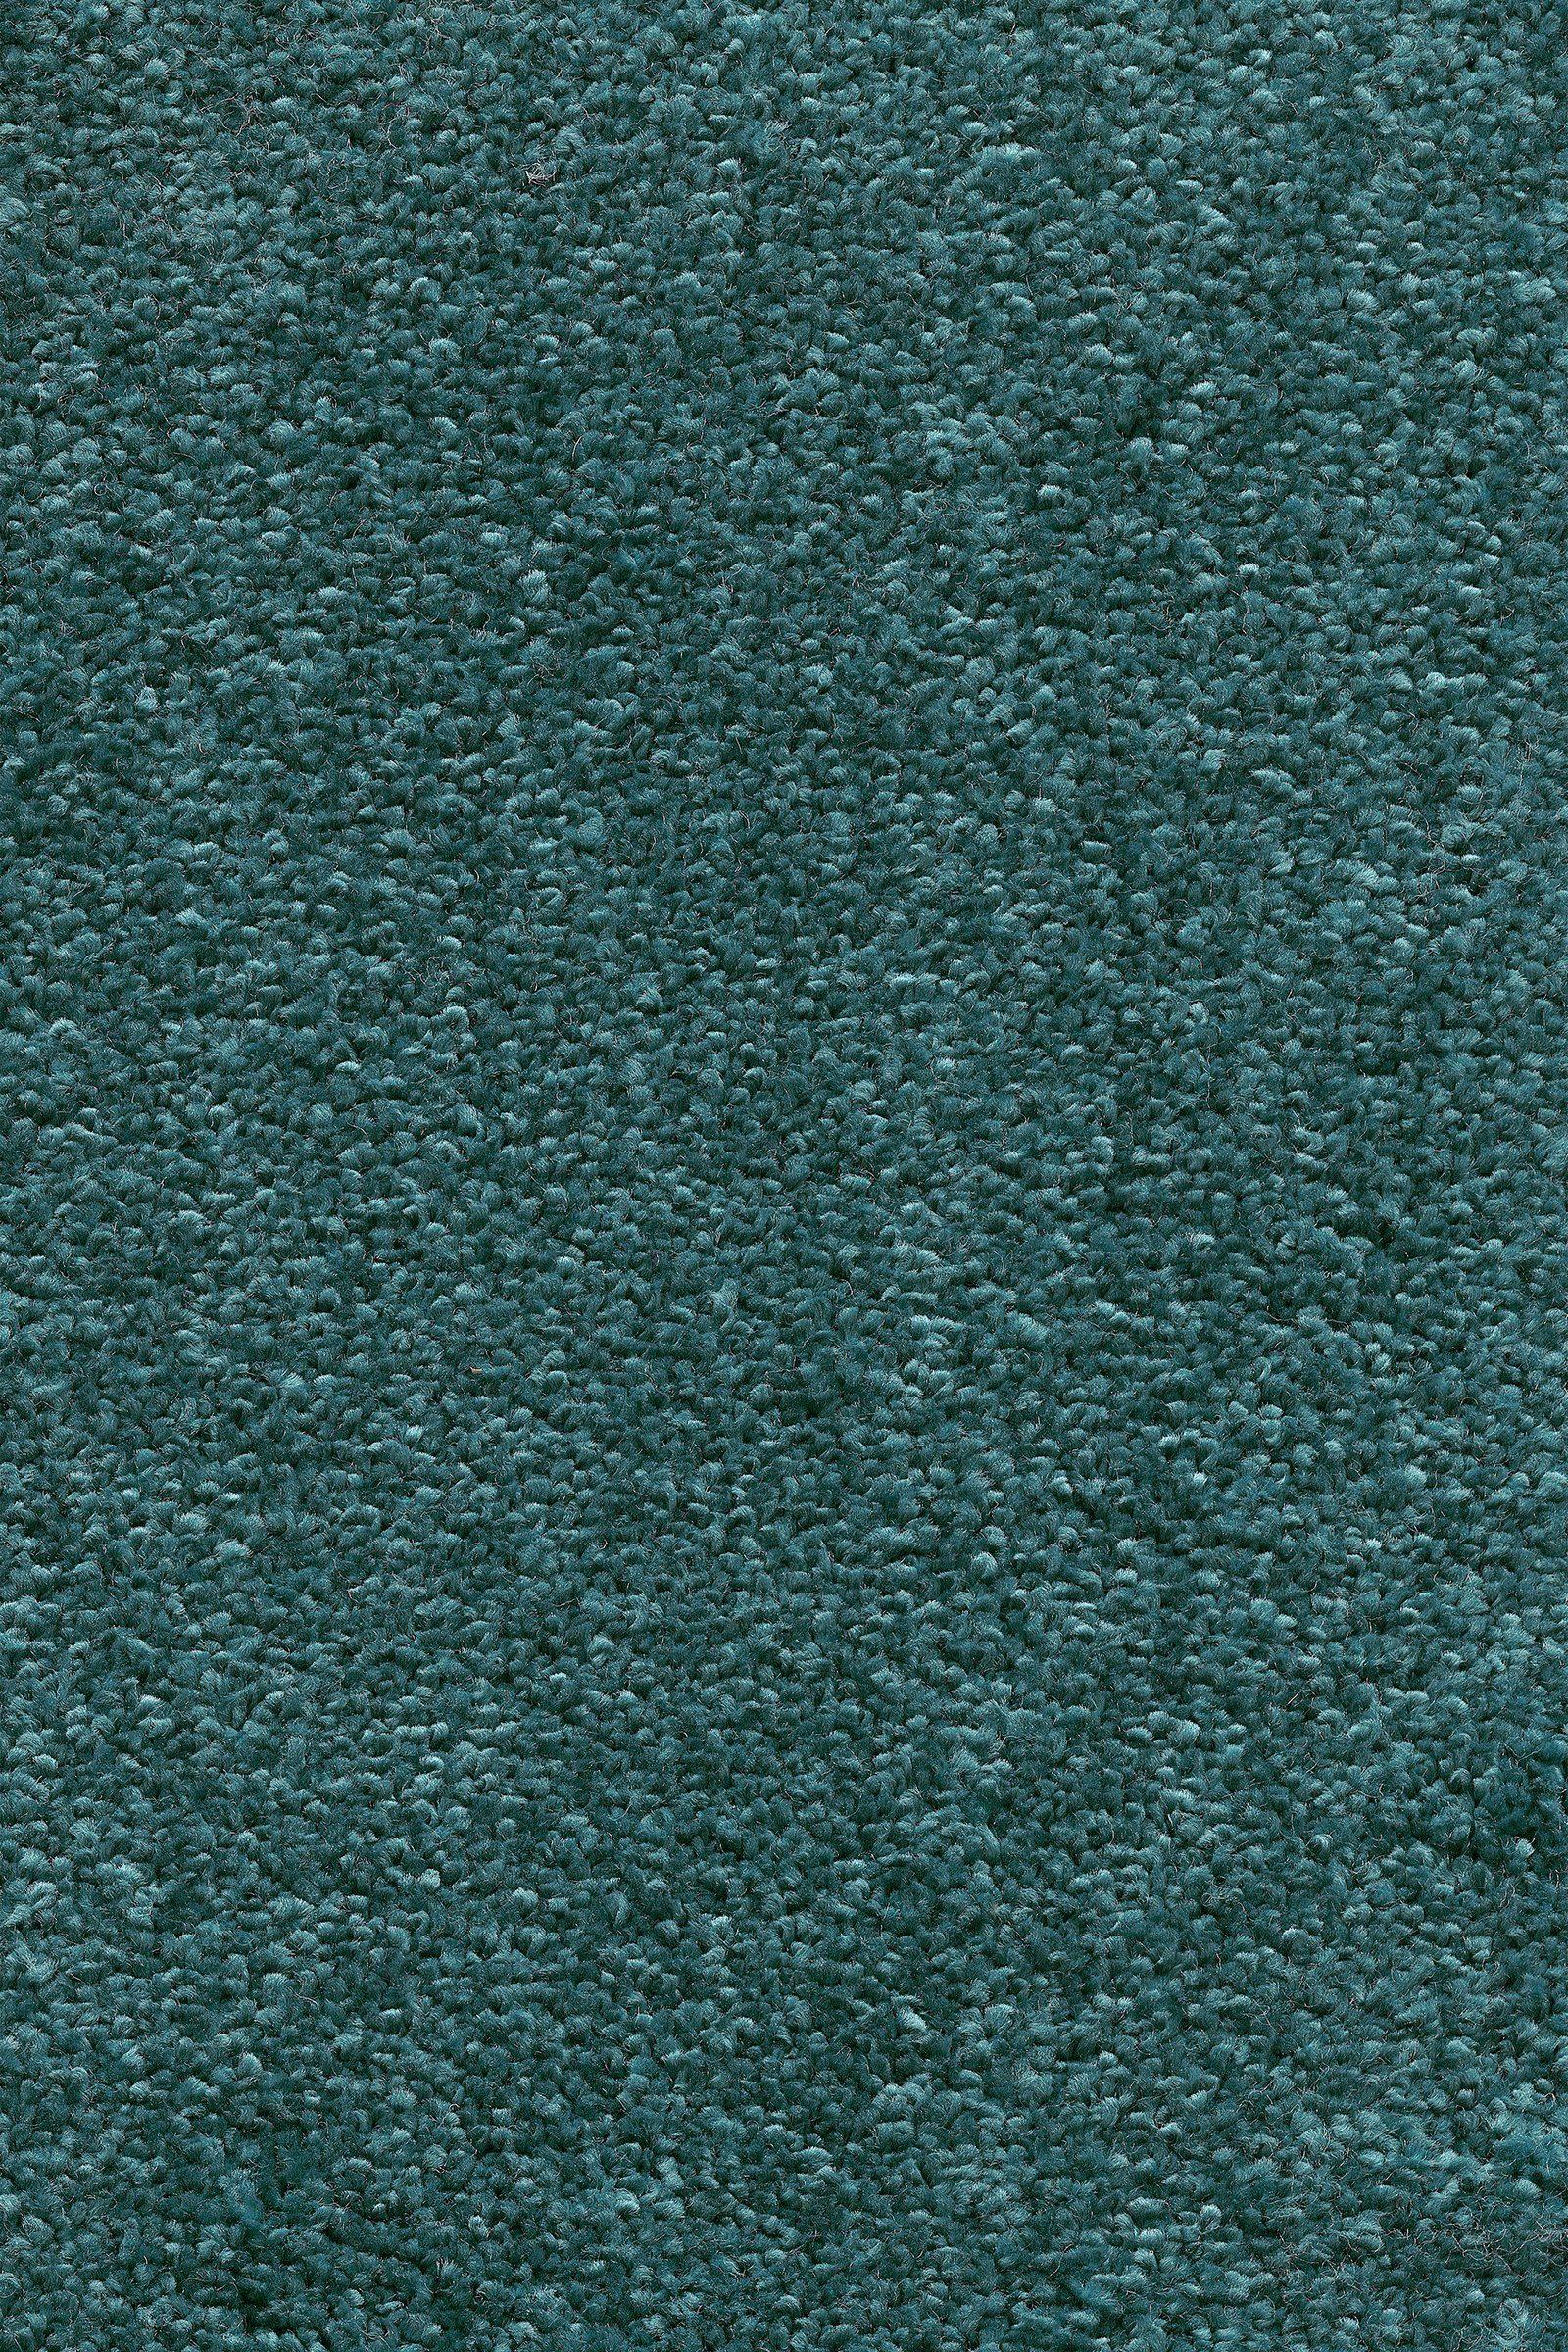 ANDIAMO Teppichboden »Mosel blau«, Breite 400 cm